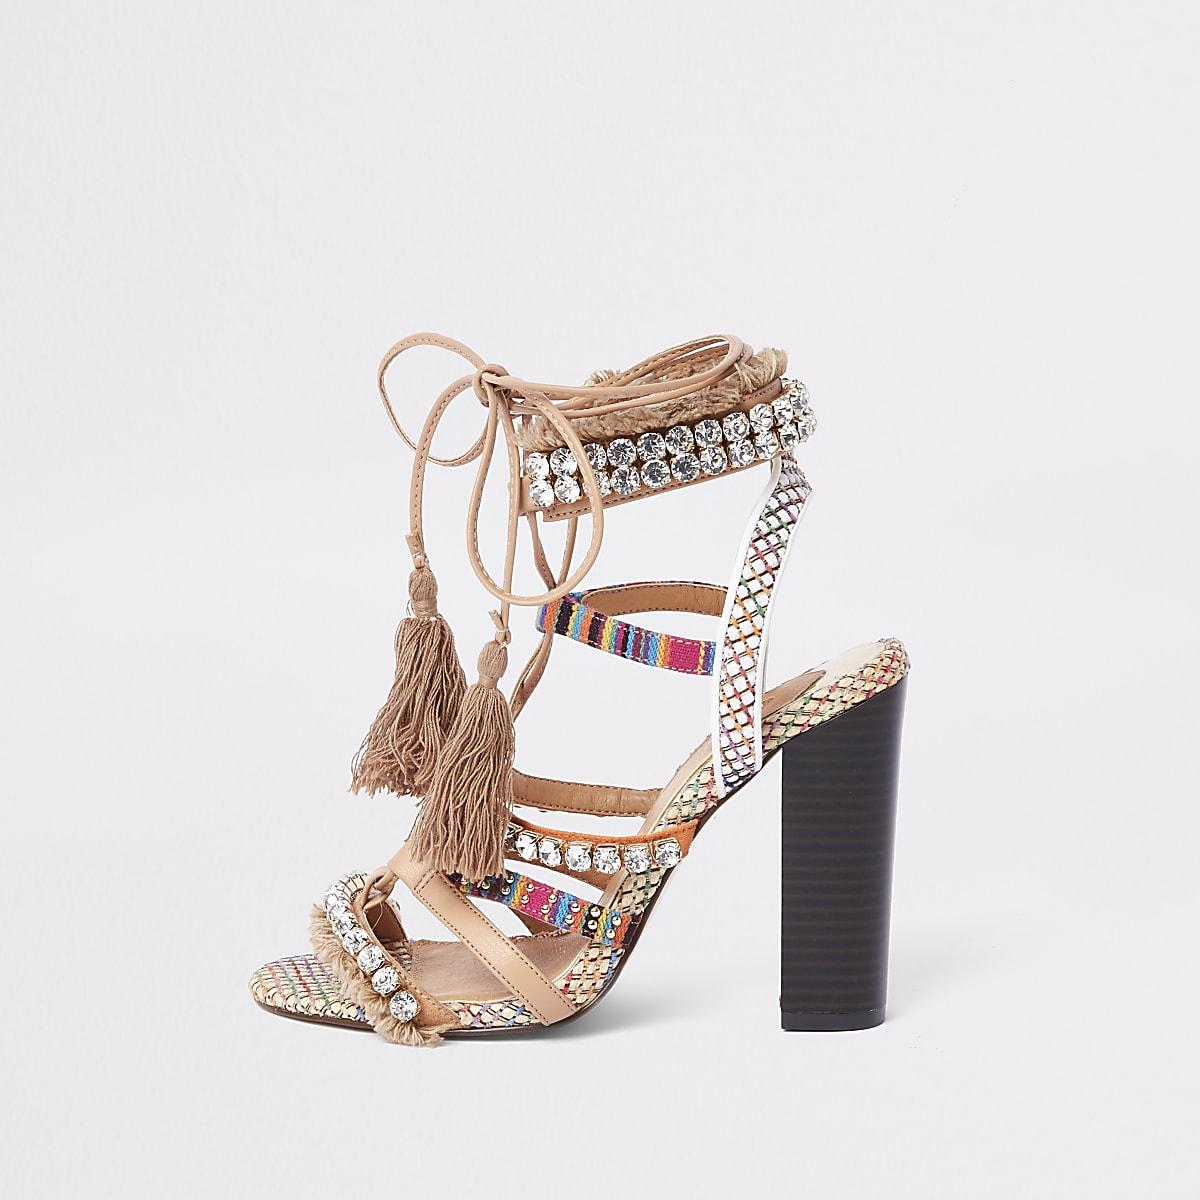 dafe358b2b Beige gem block heel sandals - Sandals - Shoes & Boots - women